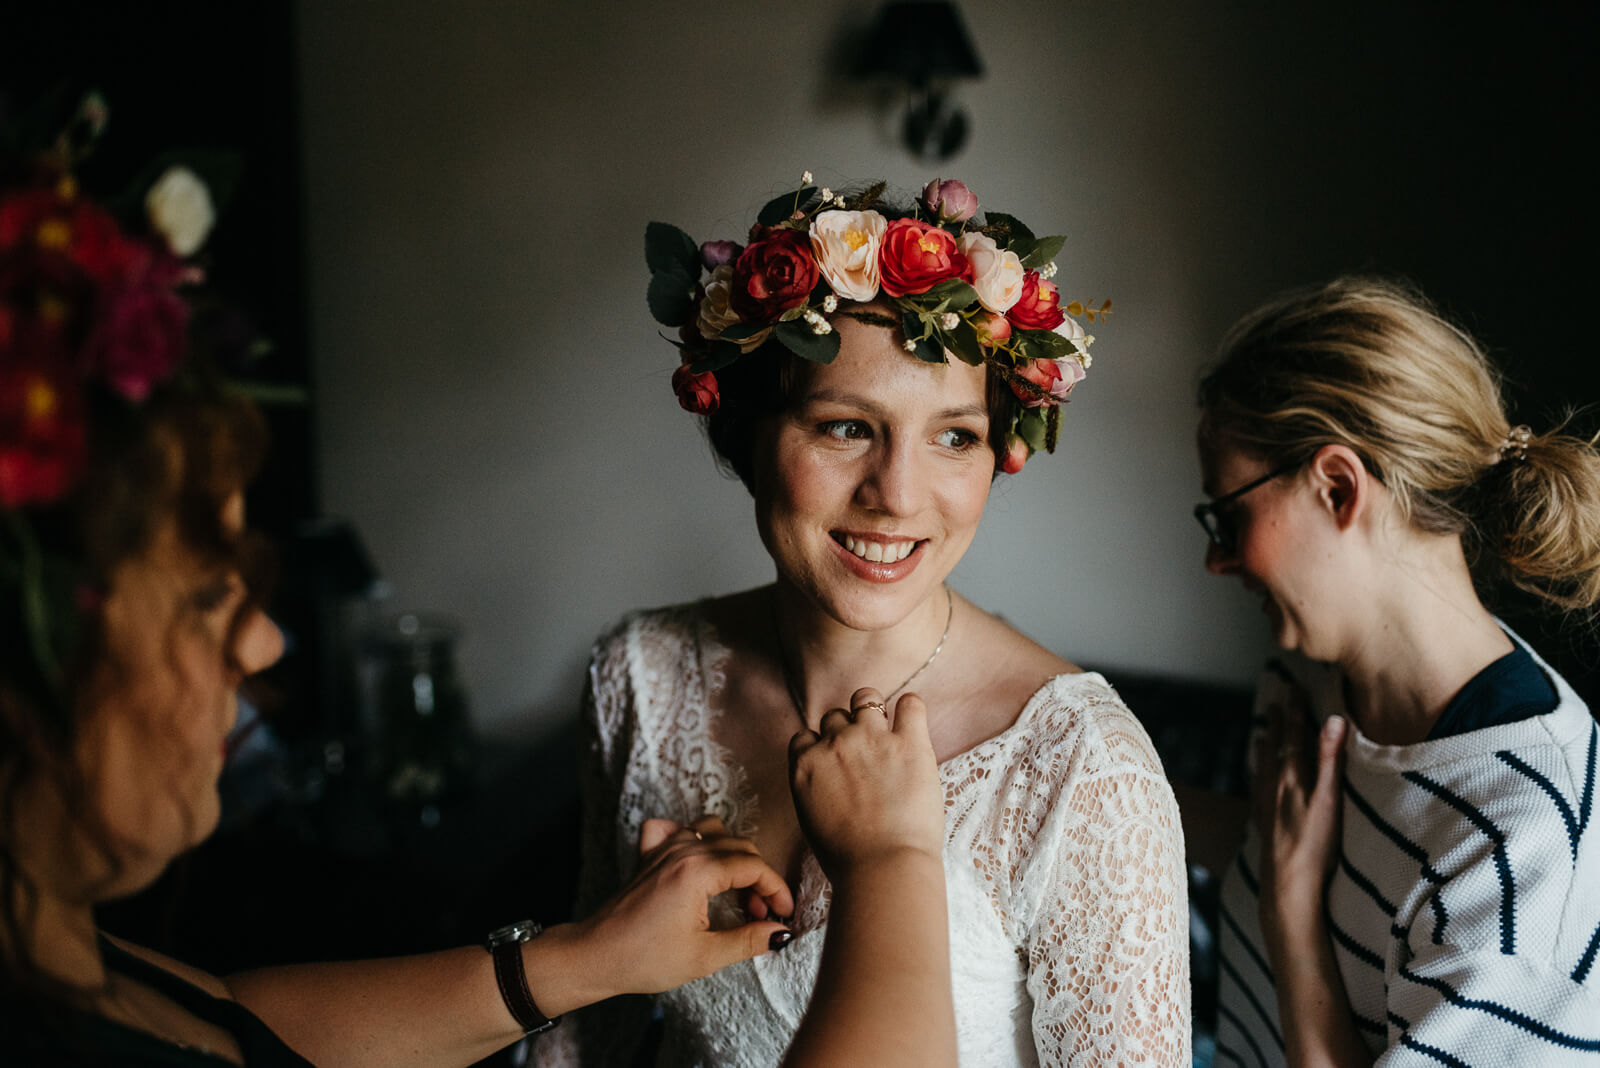 boho bride during her bridal preparations at Hampshire hotel